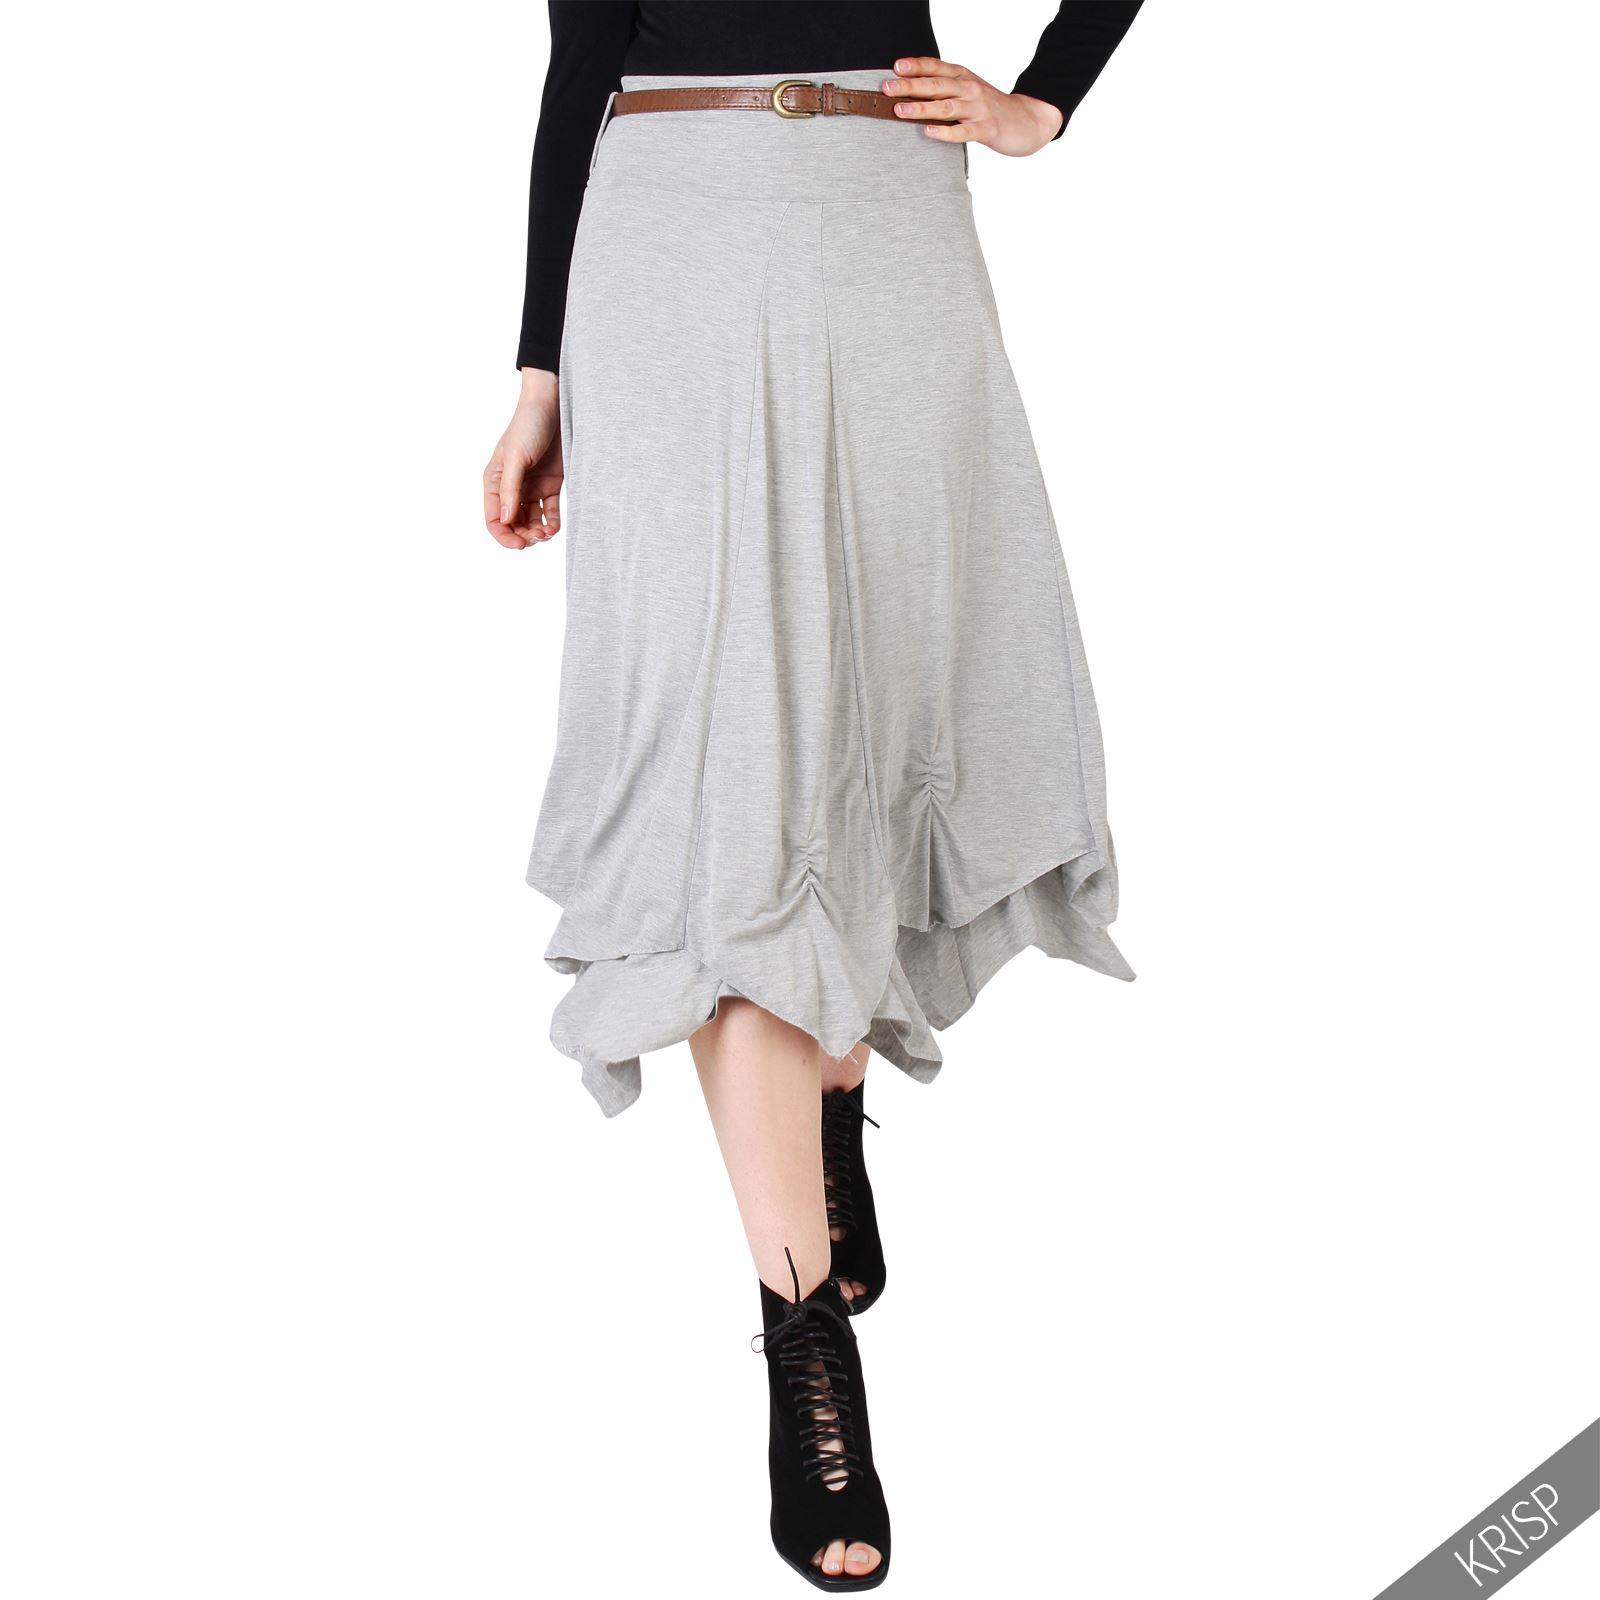 krisp femme jupe maxi lastique hippie longue boho taille 36 38 40 42 44 46 48 ebay. Black Bedroom Furniture Sets. Home Design Ideas